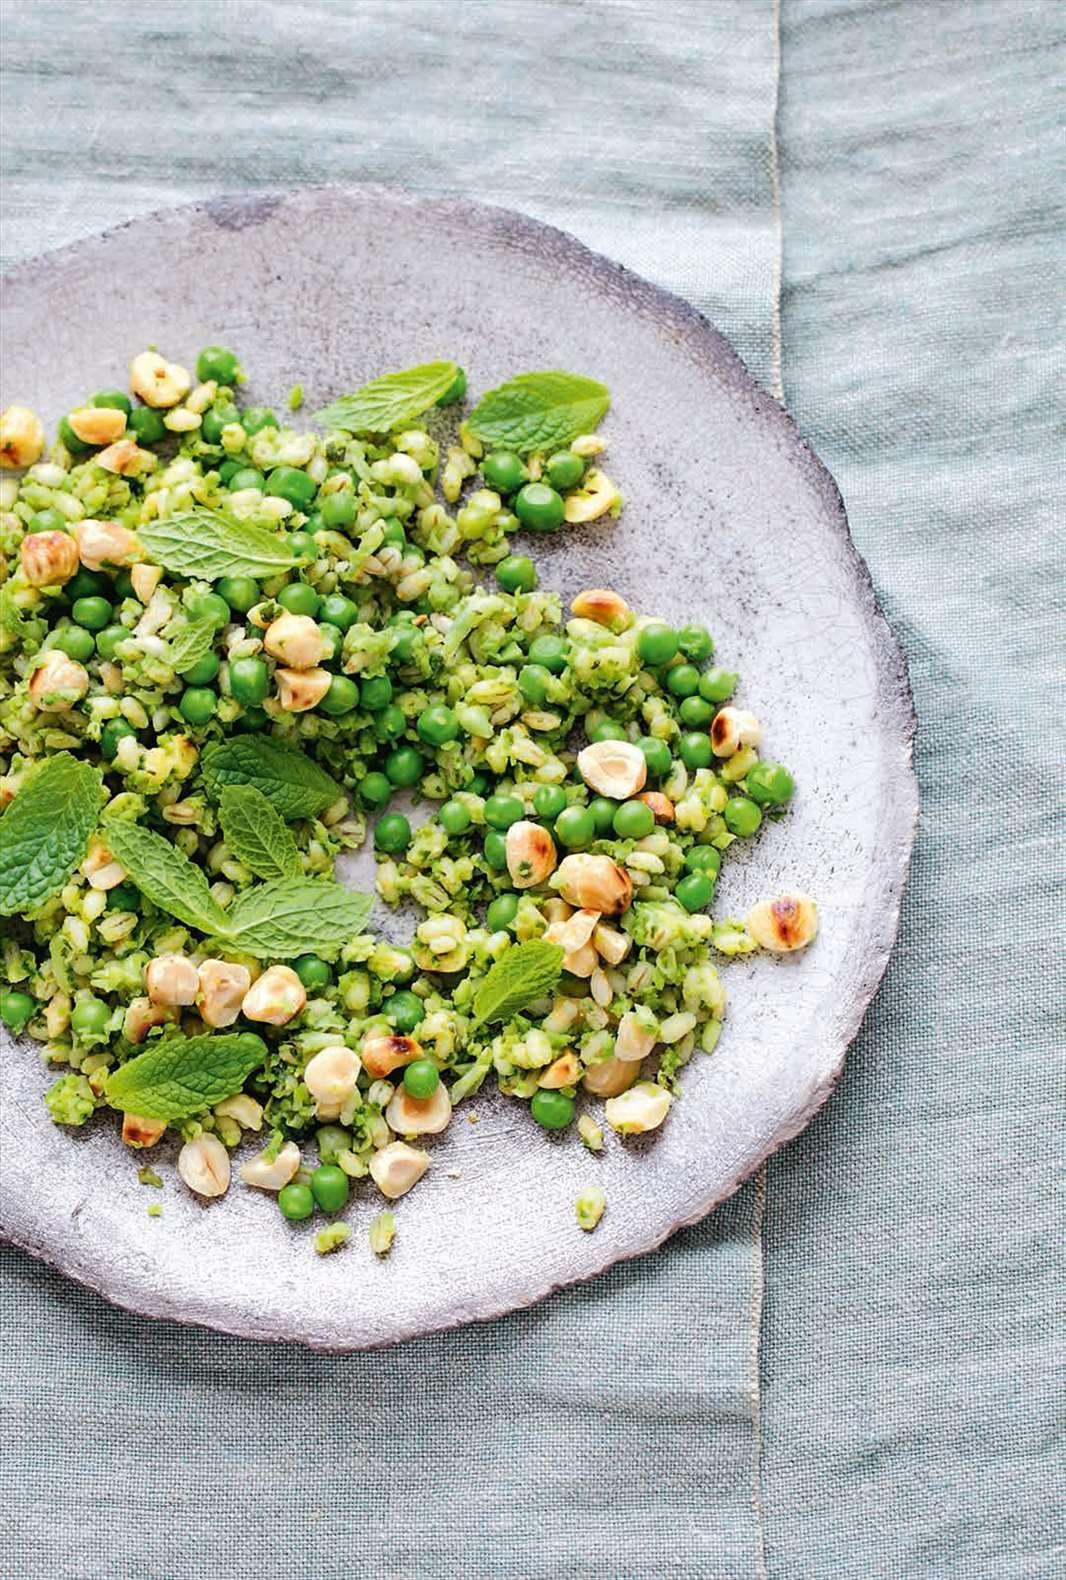 Barley Salad with Chickpeas, Fava Beans Peas advise